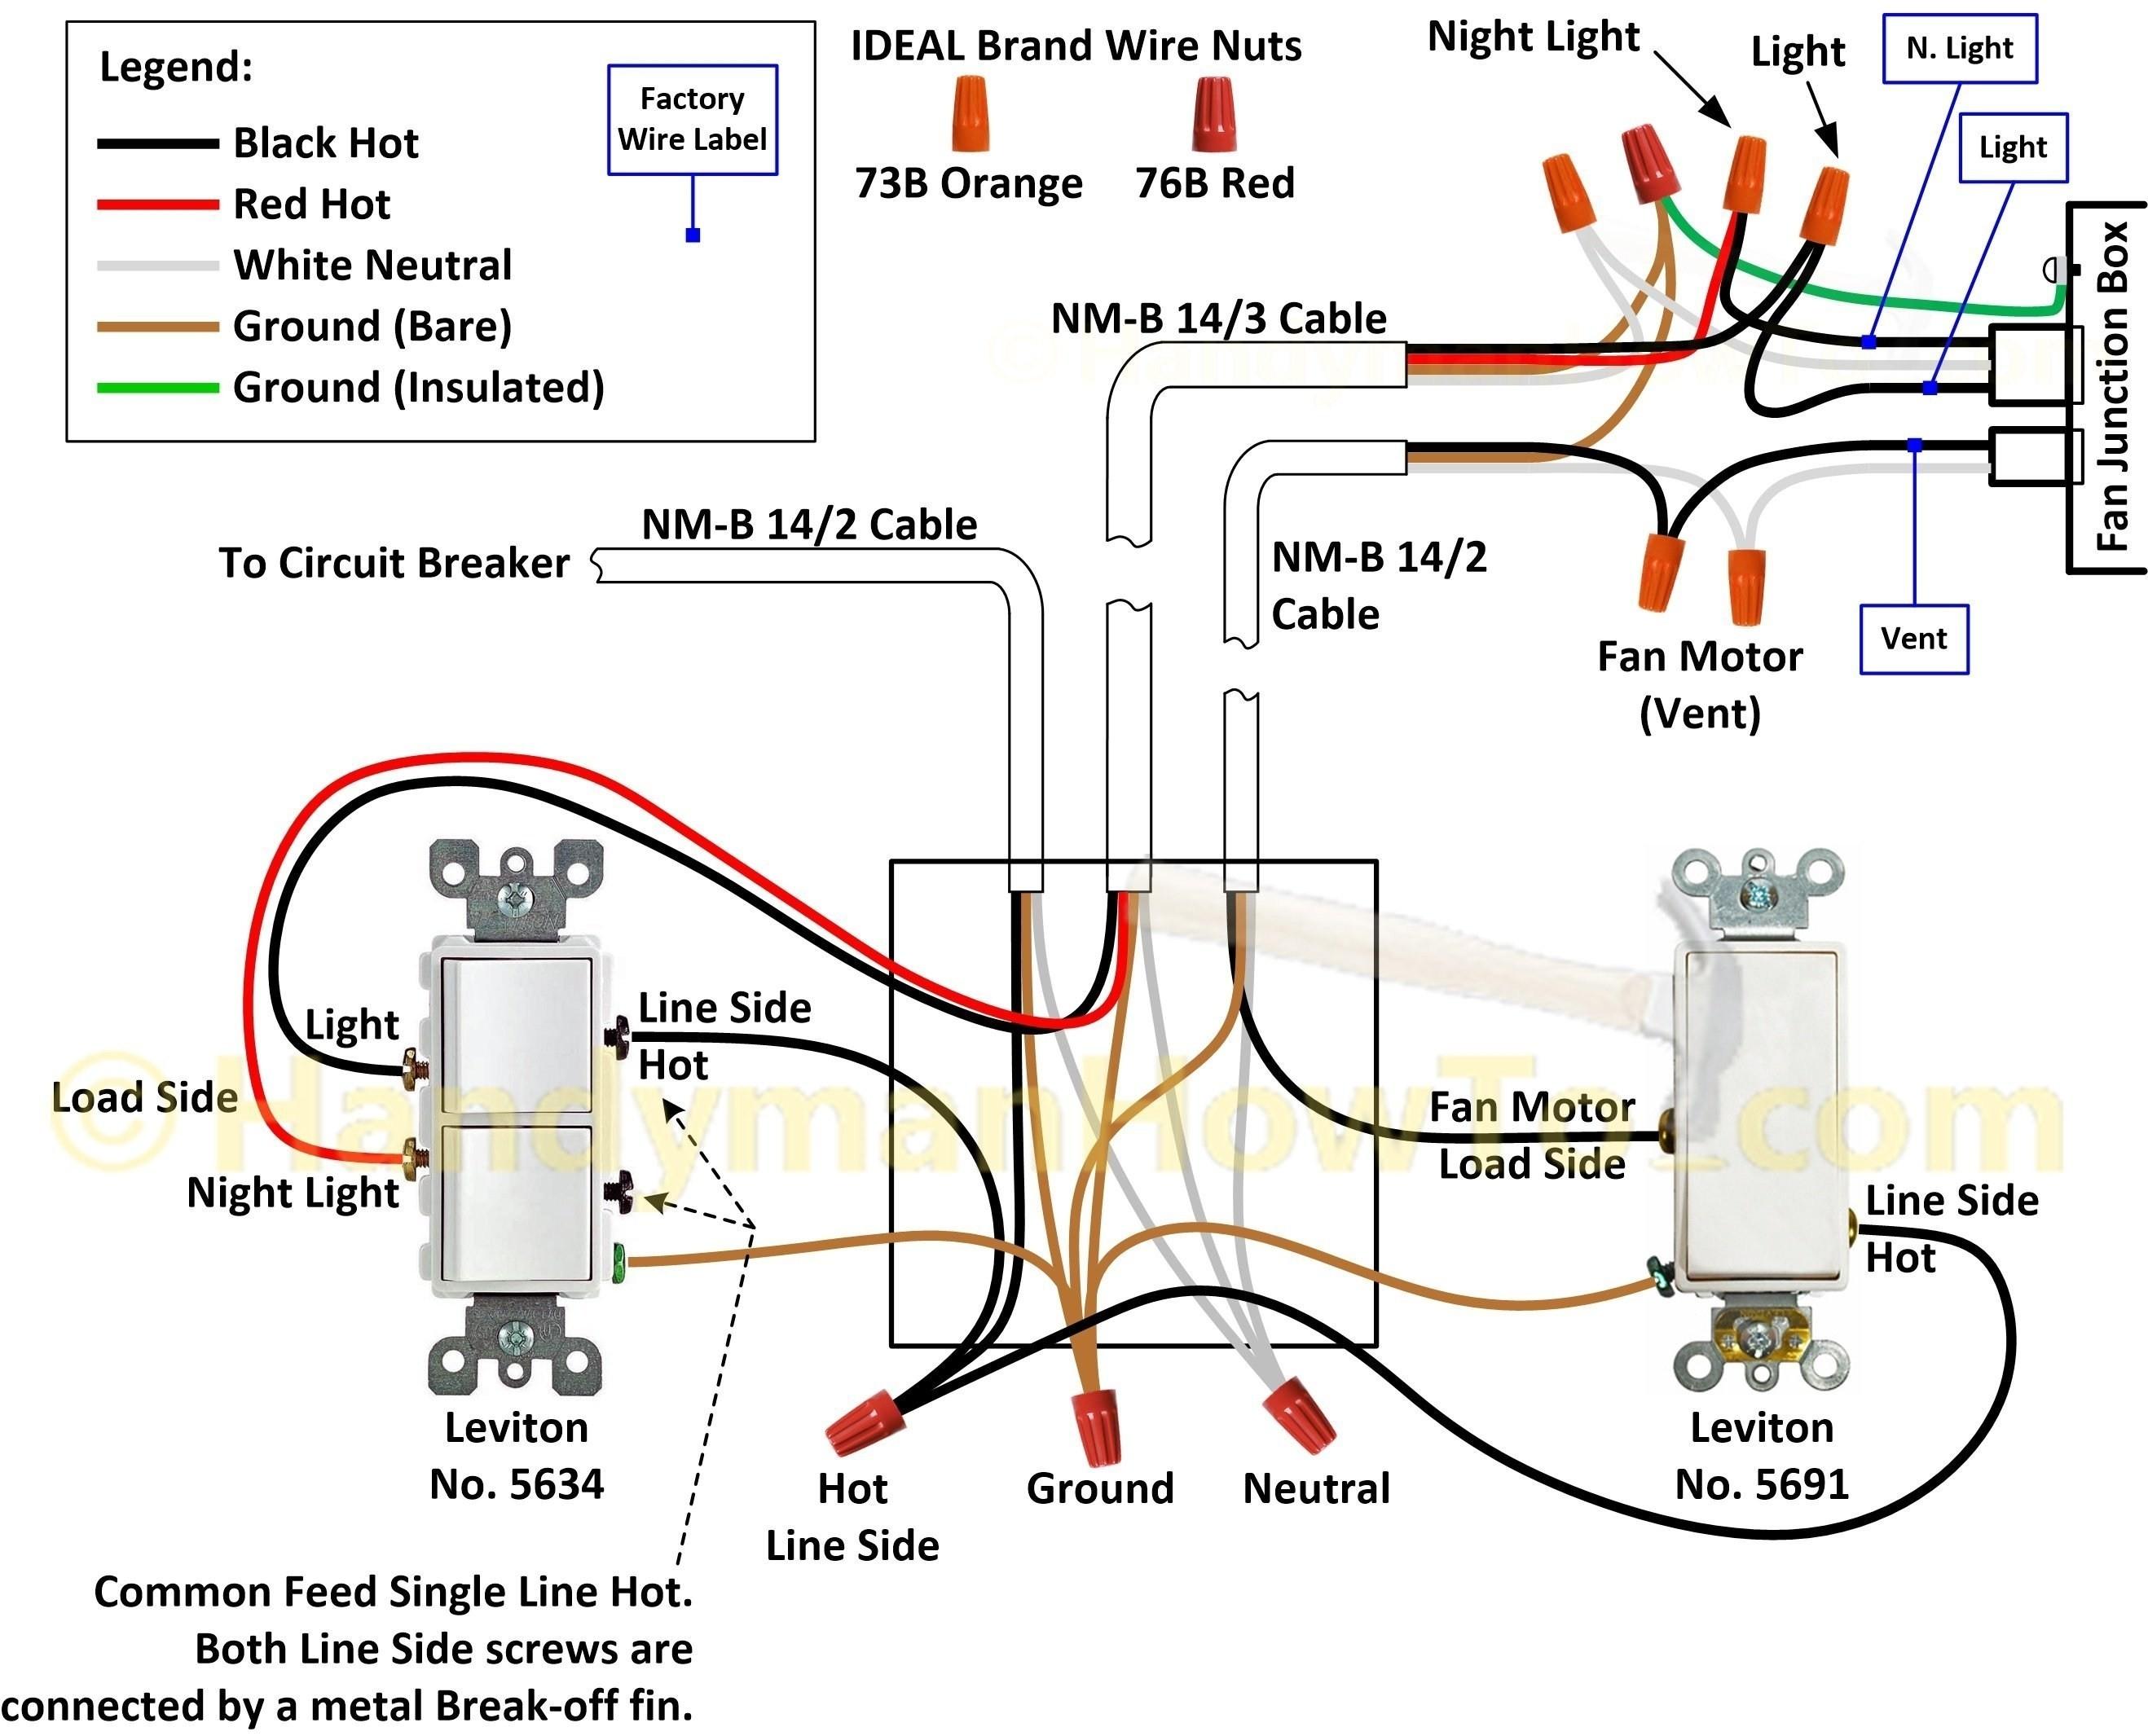 Electric Motor Wiring Diagram Electrical Wiring Diagrams Example Wiring Diagram Lighting Of Electric Motor Wiring Diagram